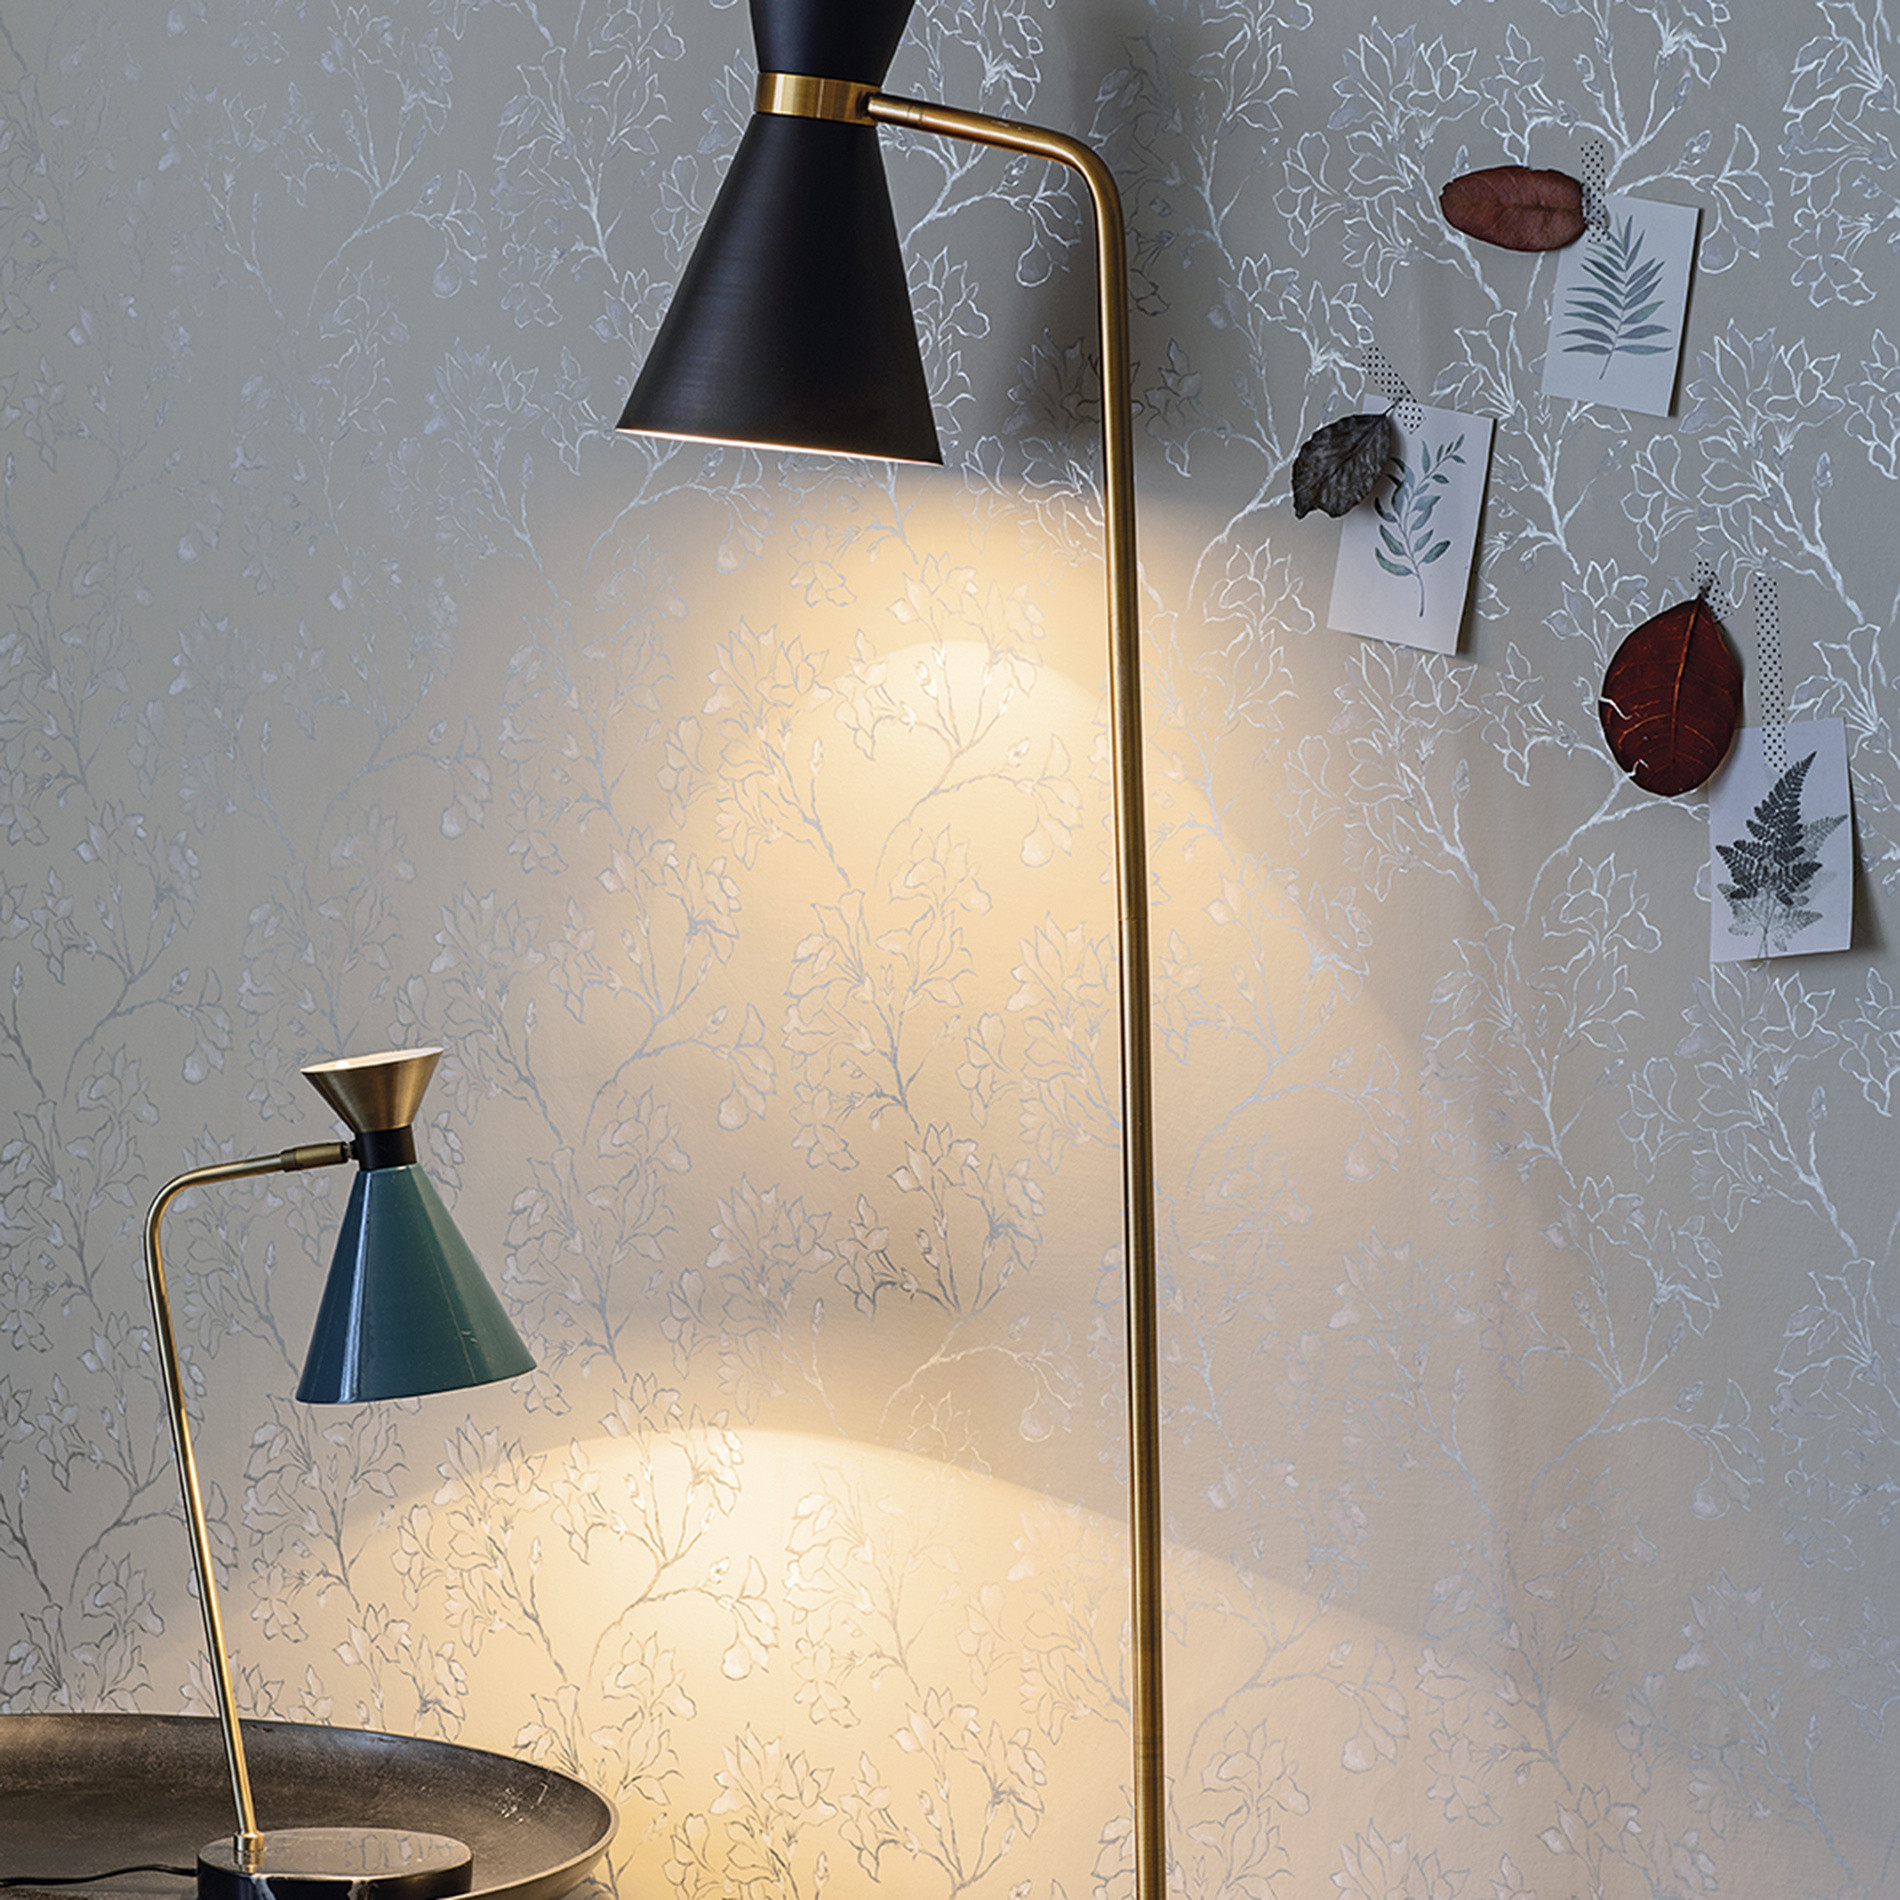 Lampada da tavolo Vintage, Petrolio, large image number 2